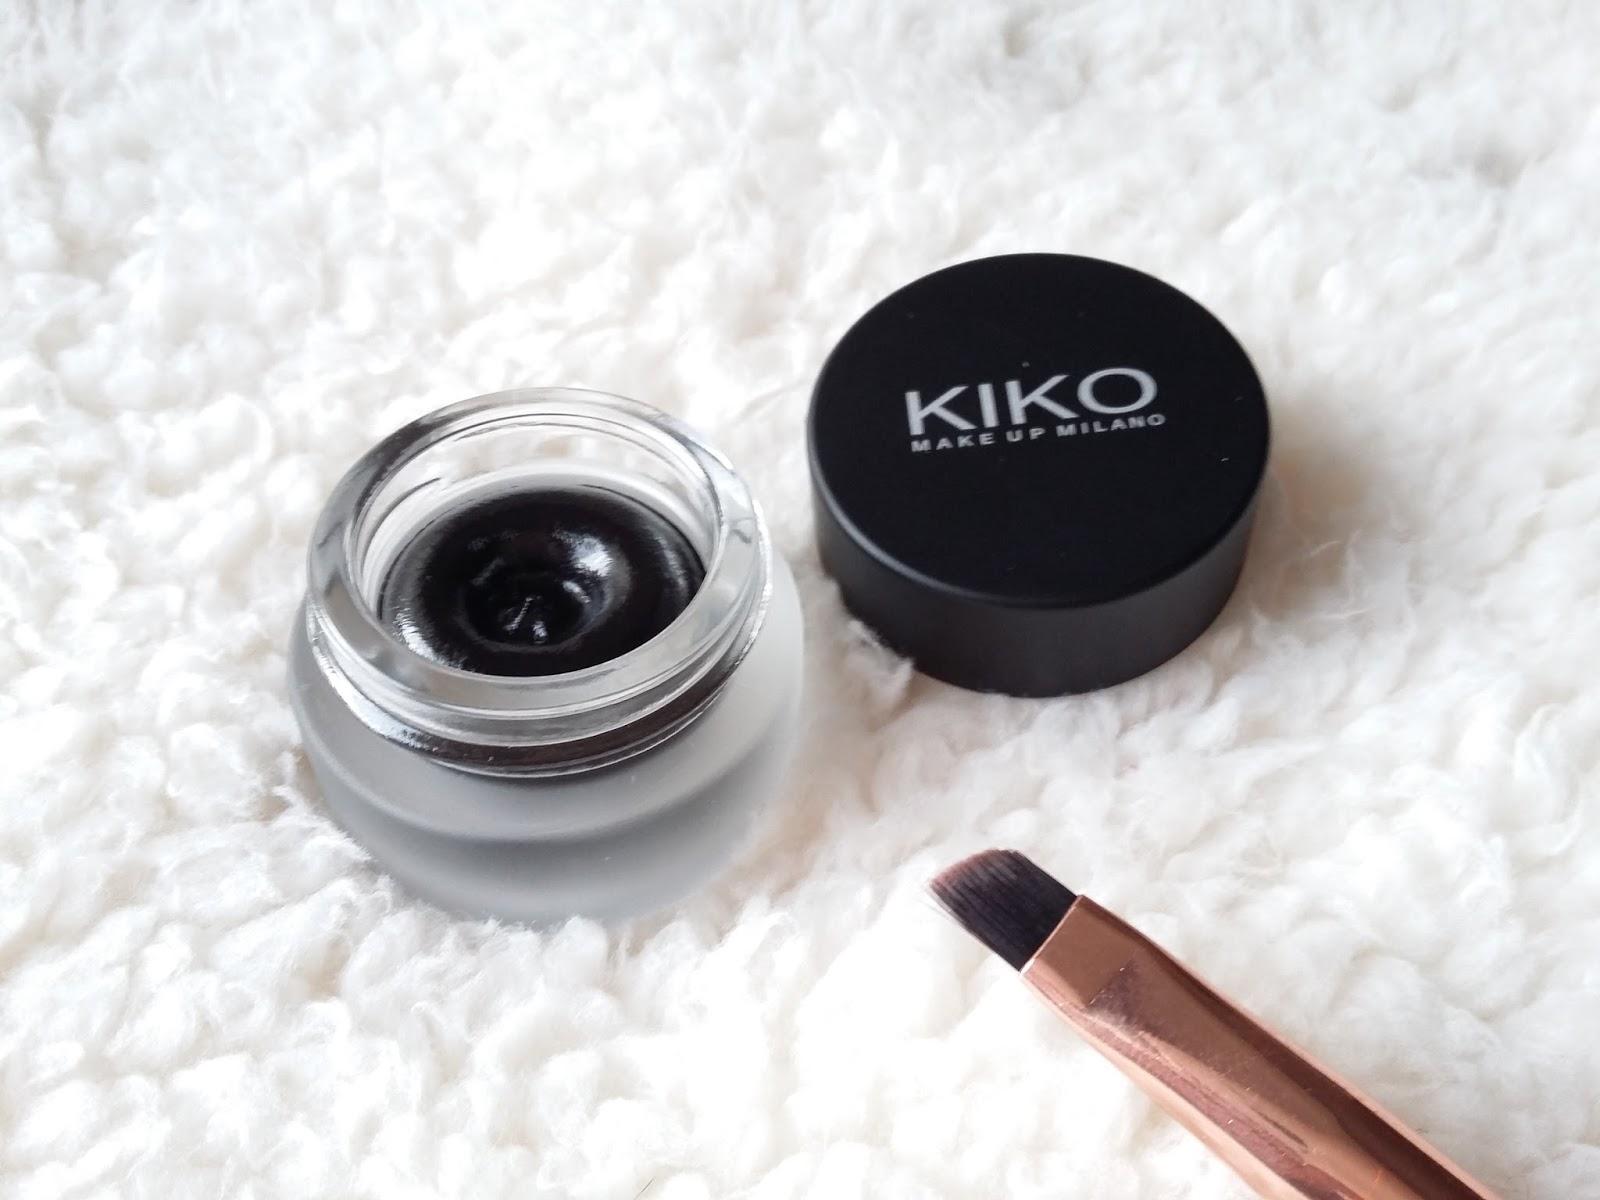 amigas do closet review lasting gel eyeliner by kiko milano